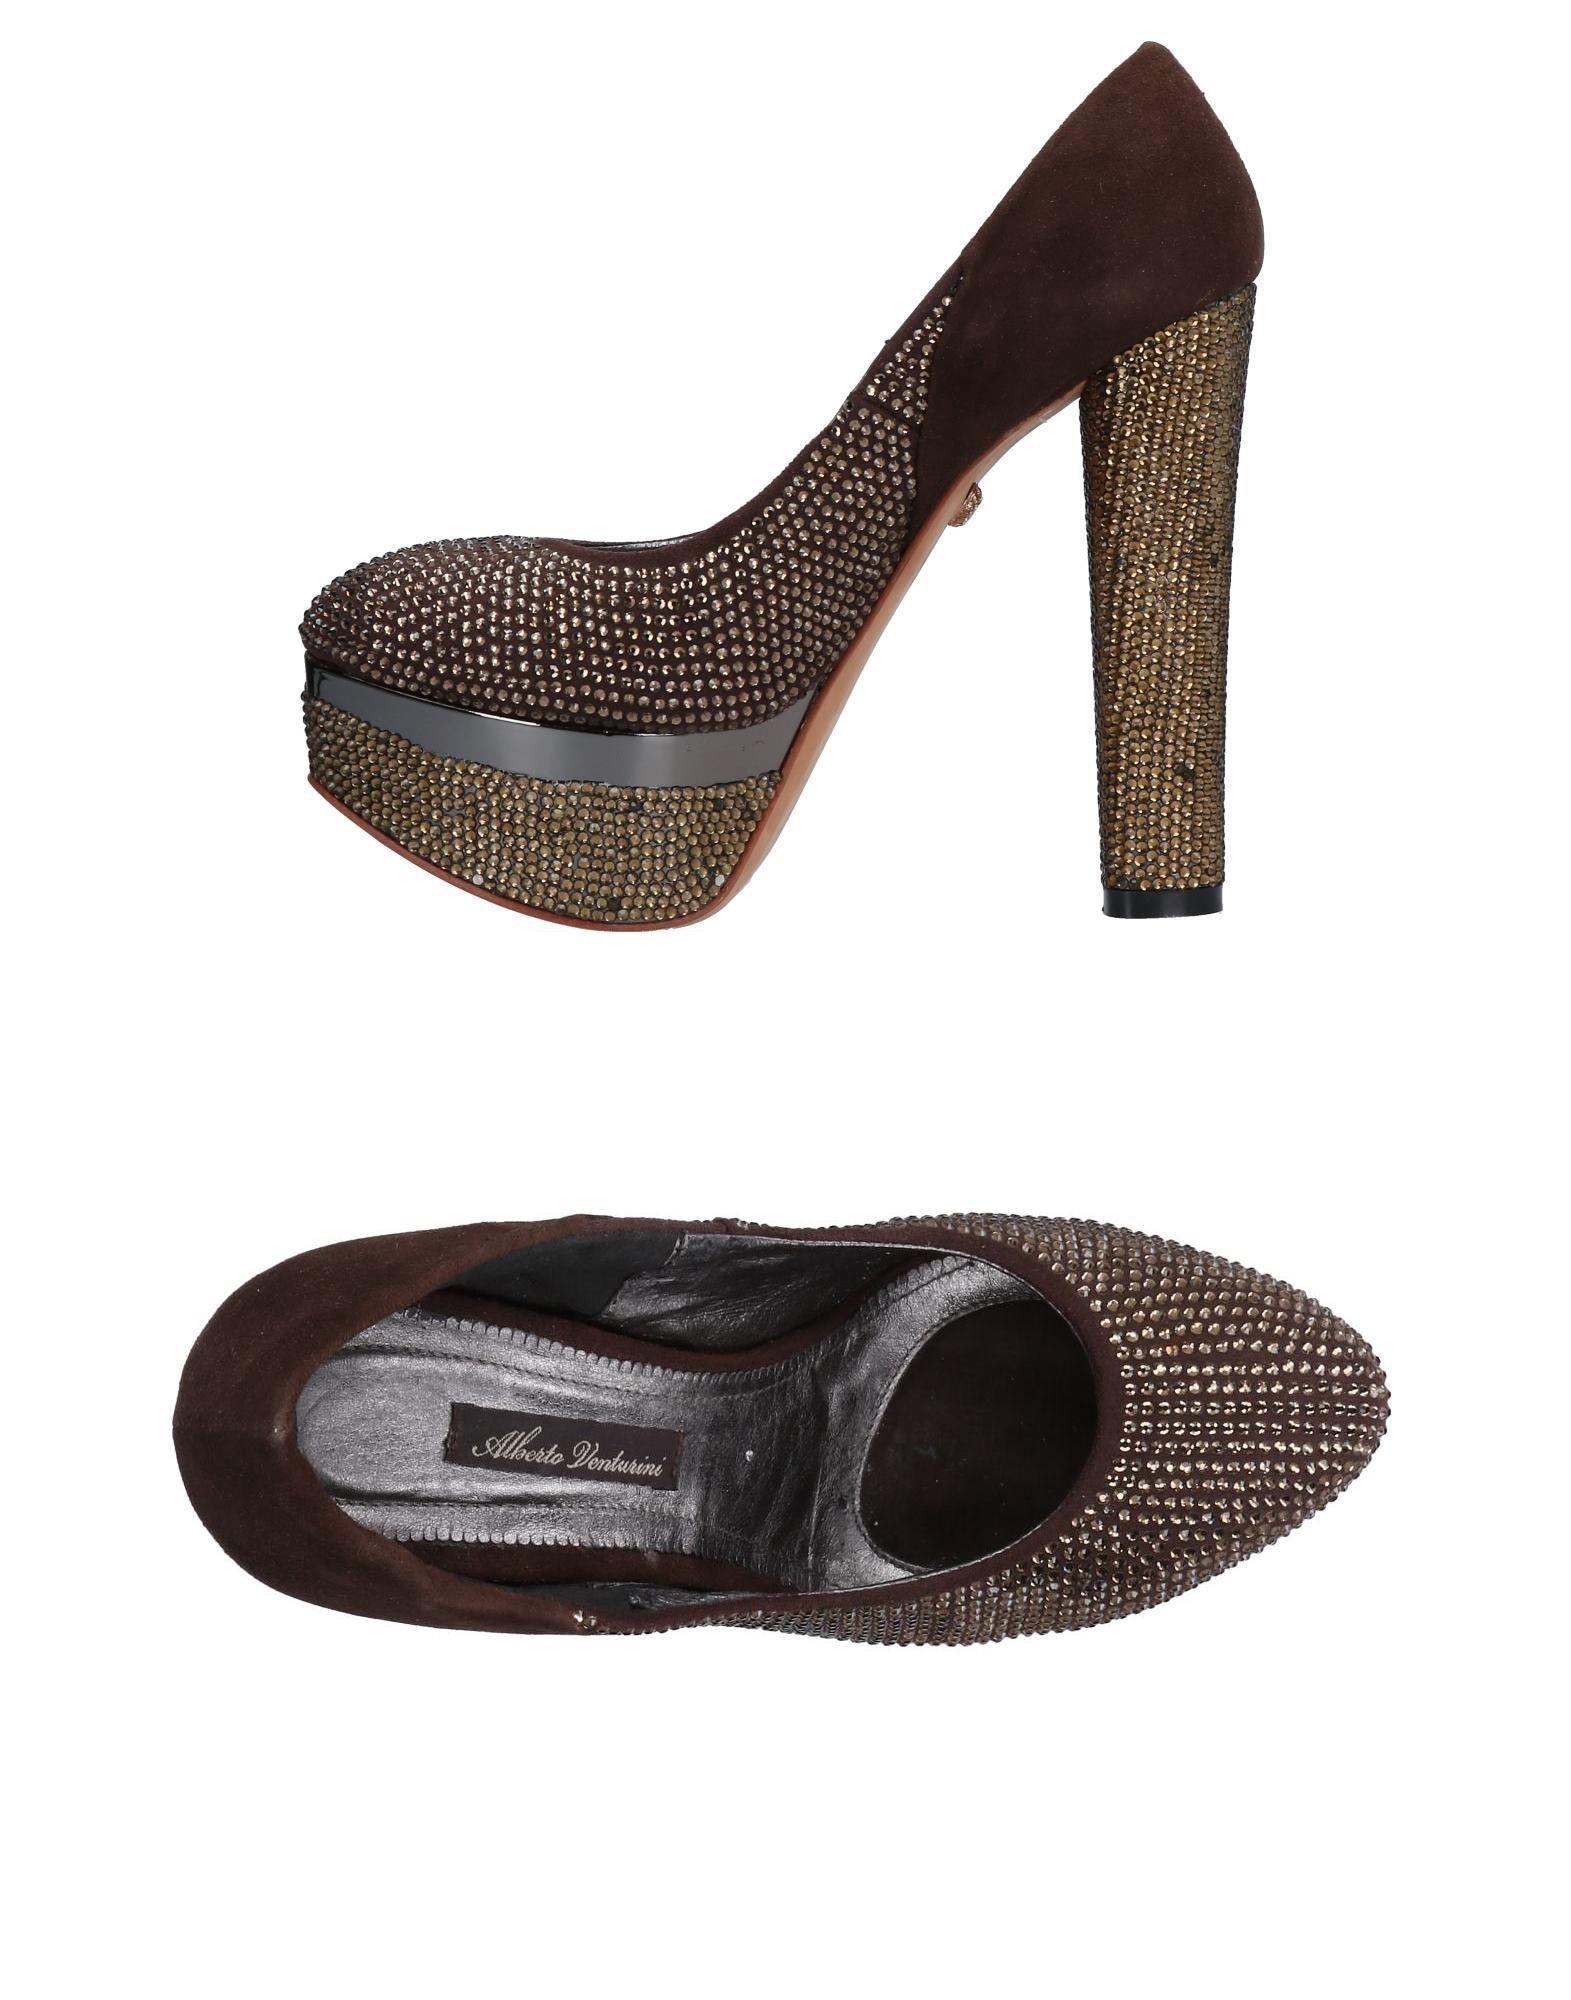 Rabatt 11483097DP Schuhe Alberto Venturini Pumps Damen  11483097DP Rabatt 275dfe